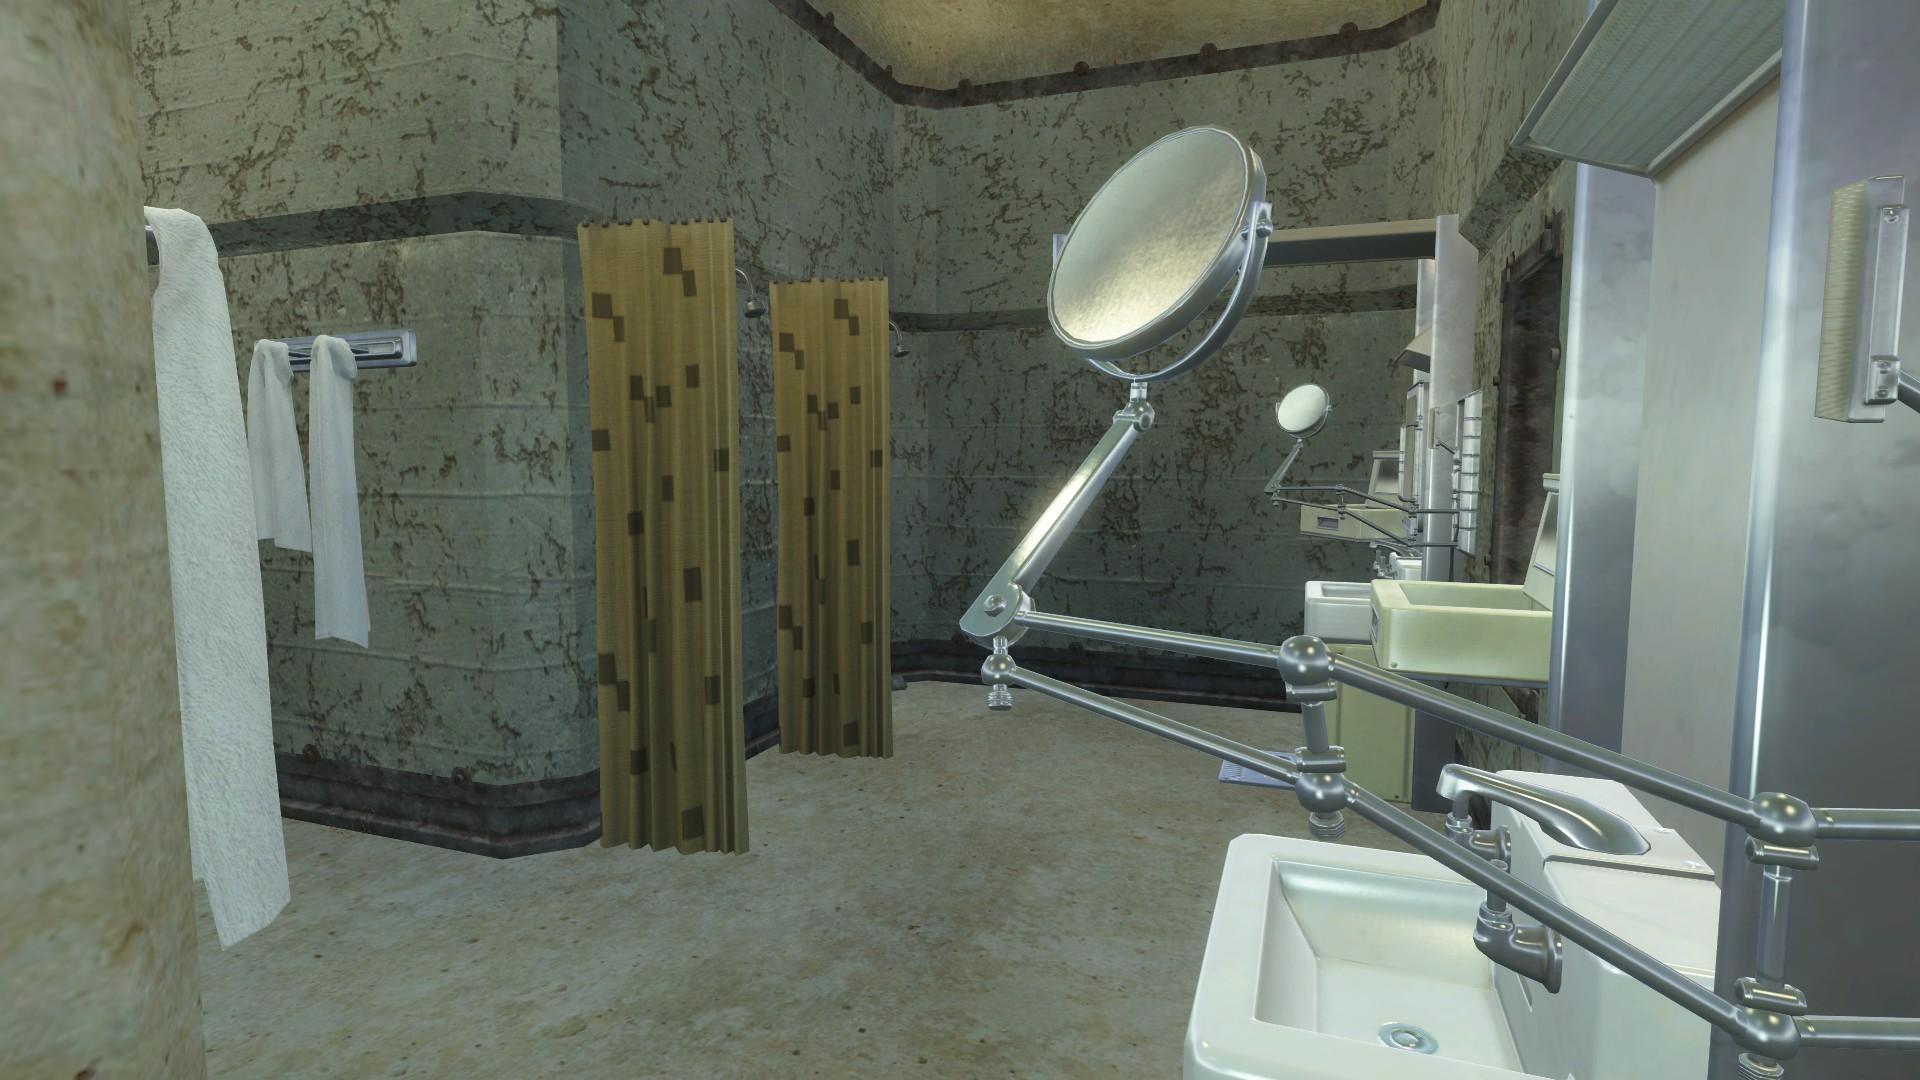 Show your Fallout 4 Settlements! FF2635B6F2CBDC7D148506F7A2E7D89C9467DDAB